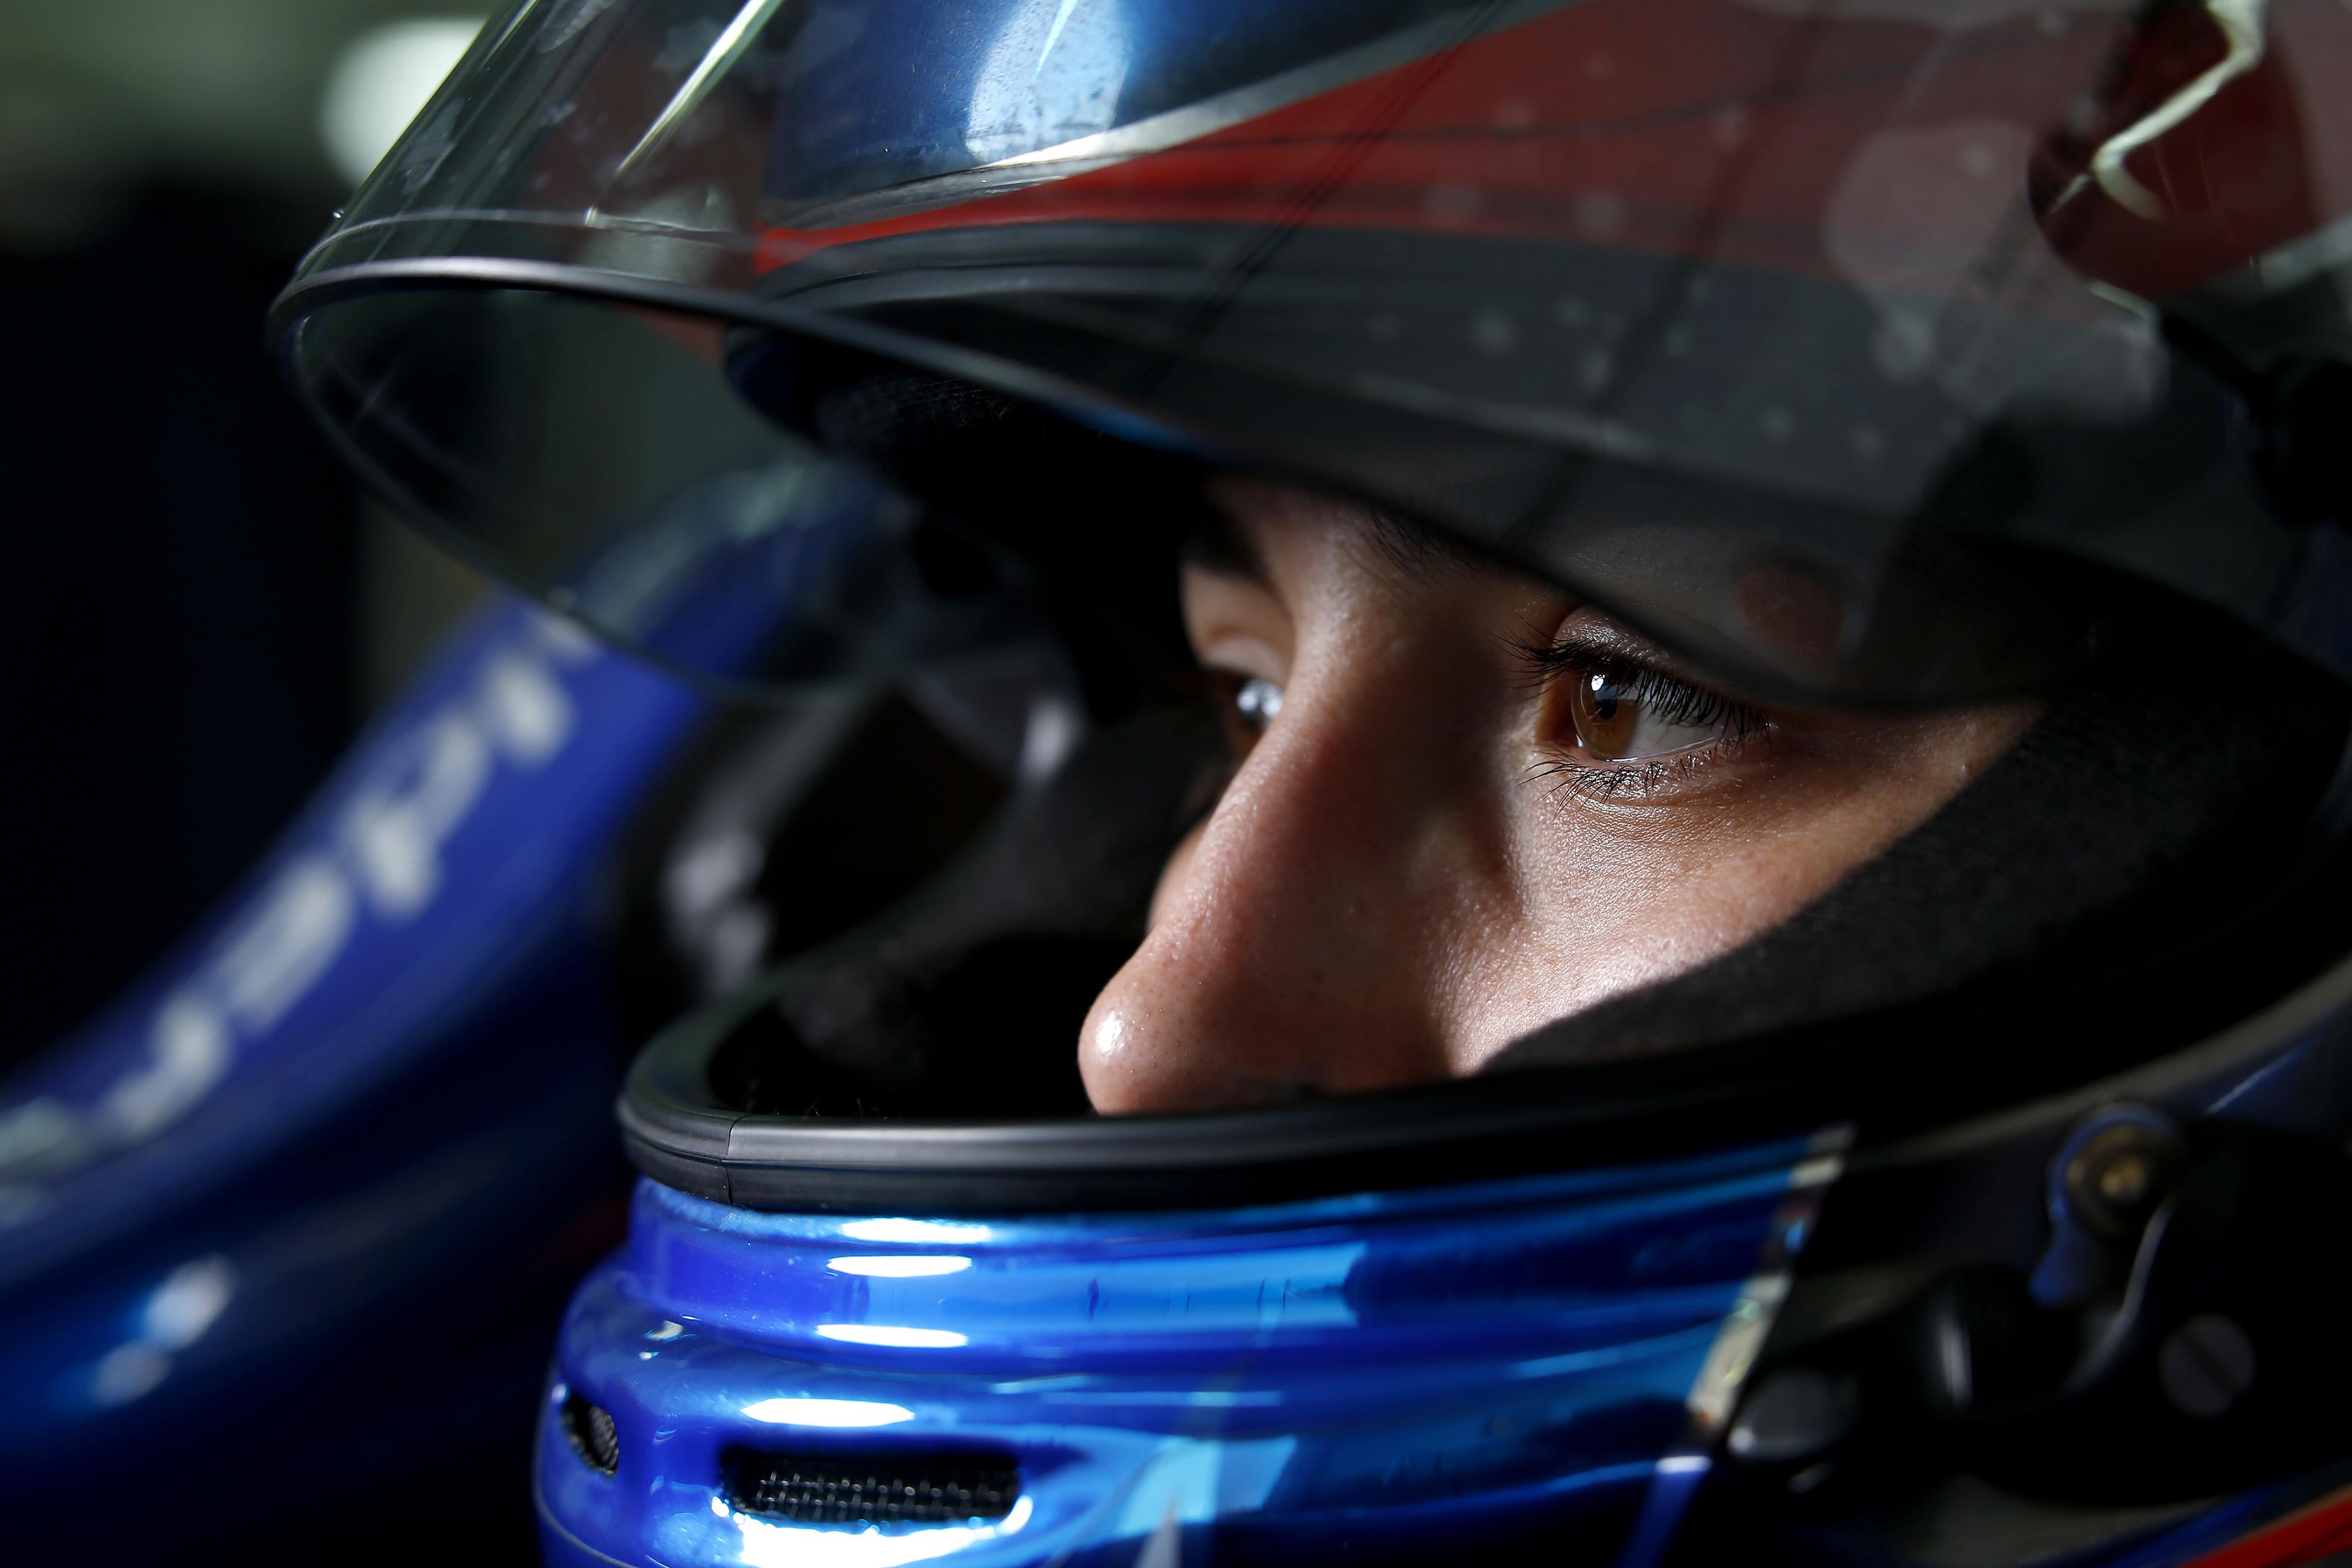 Aos 10 anos, Tatiana Calderón disse aos pais que queria correr na Formula 1; Aos 23, é piloto de testes da Sauber (Getty Images)